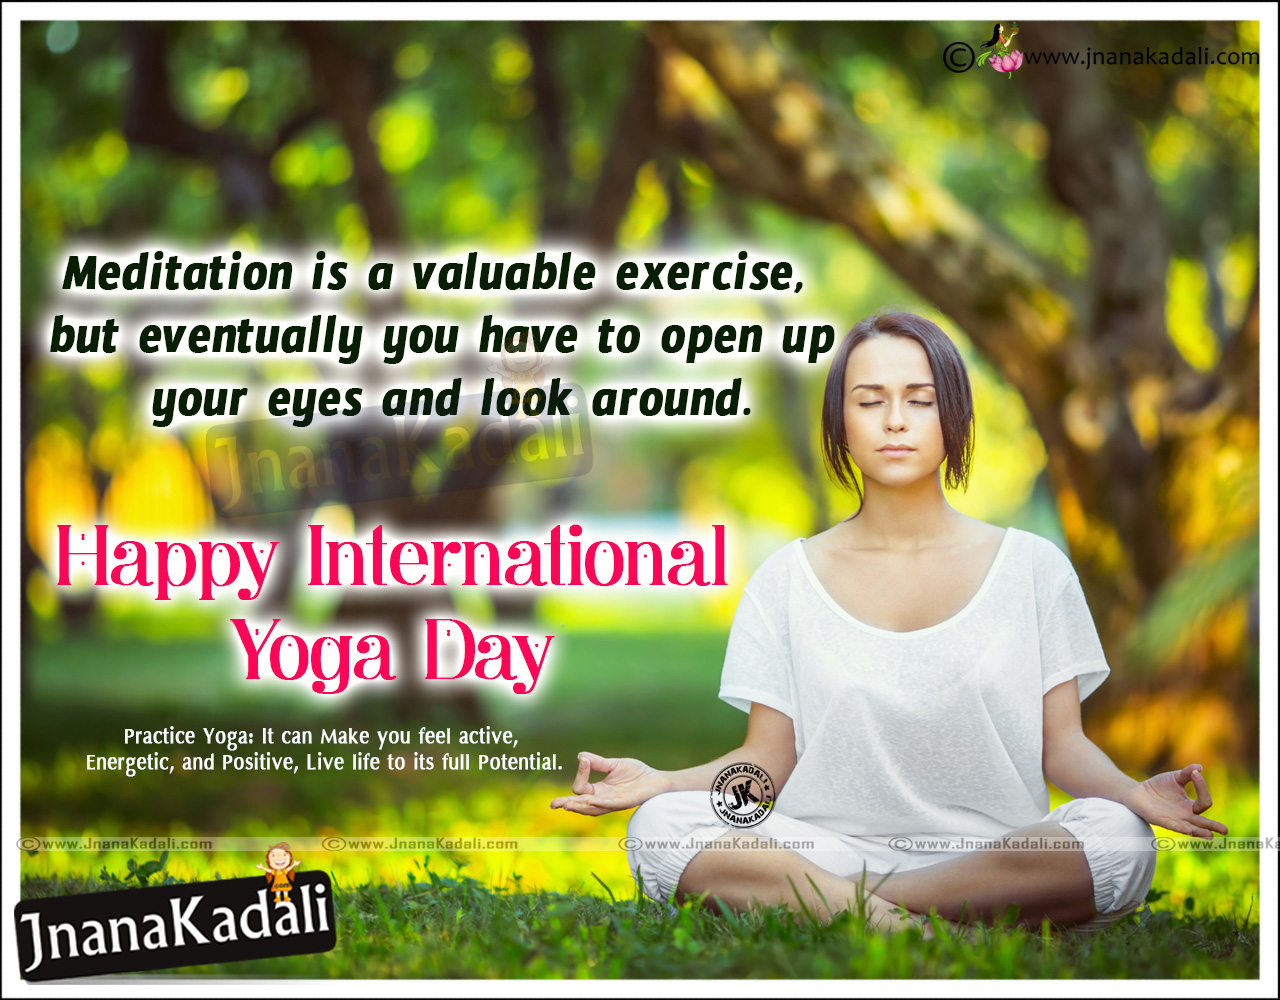 Happy International Yoga Day 2016 Quotations Pictures Jnana Kadali Com Telugu Quotes English Quotes Hindi Quotes Tamil Quotes Dharmasandehalu